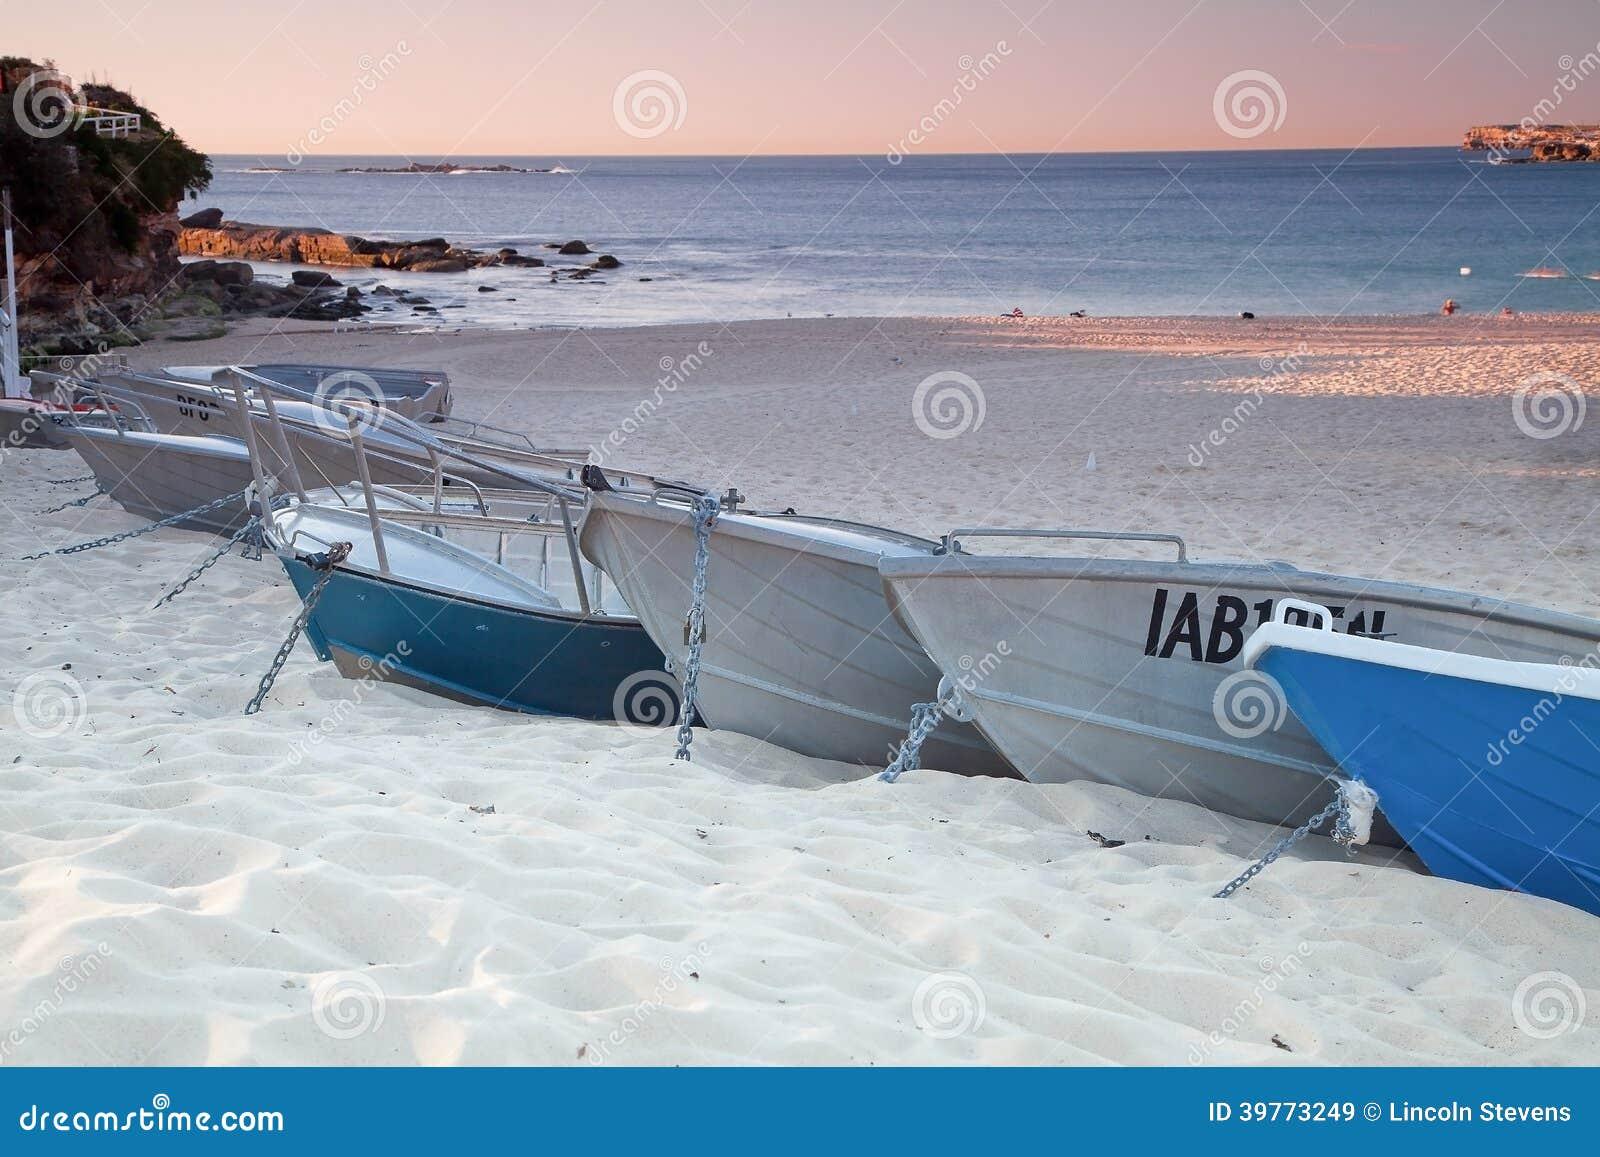 Boats White Sand Beach Stock Photo - Image: 39773249